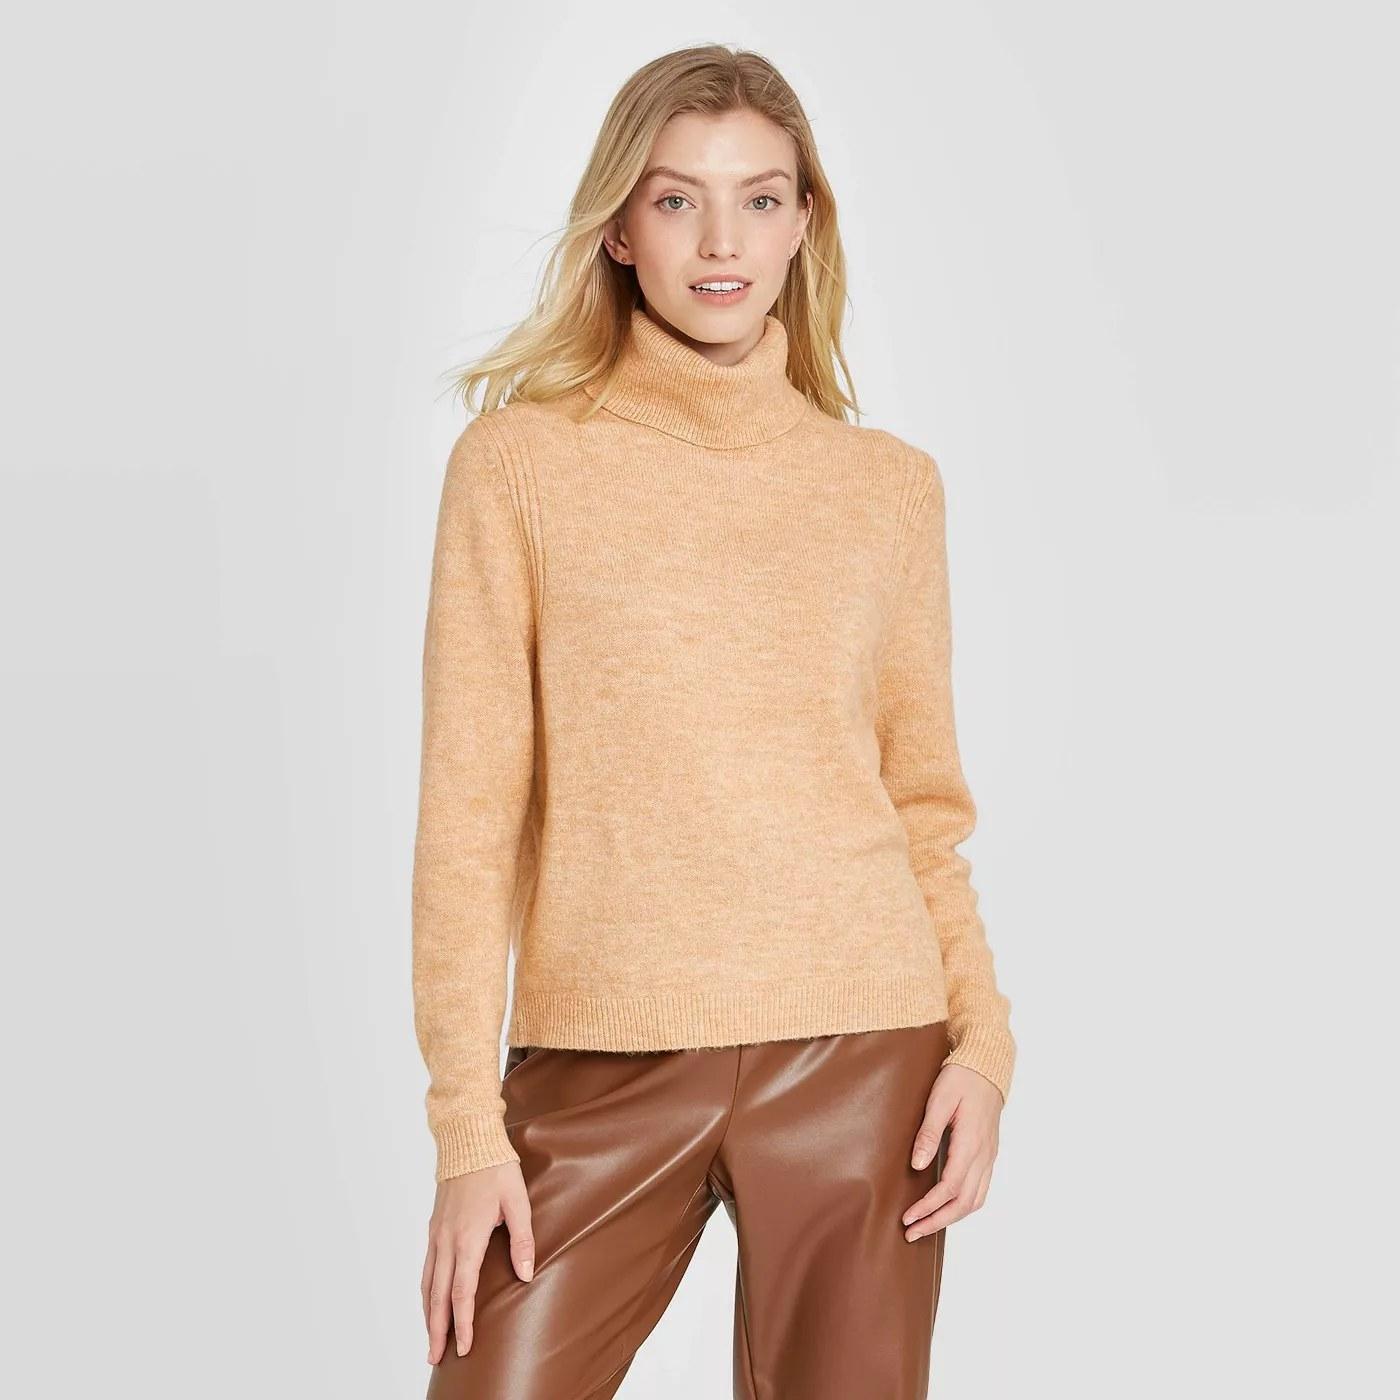 The sweater in beige